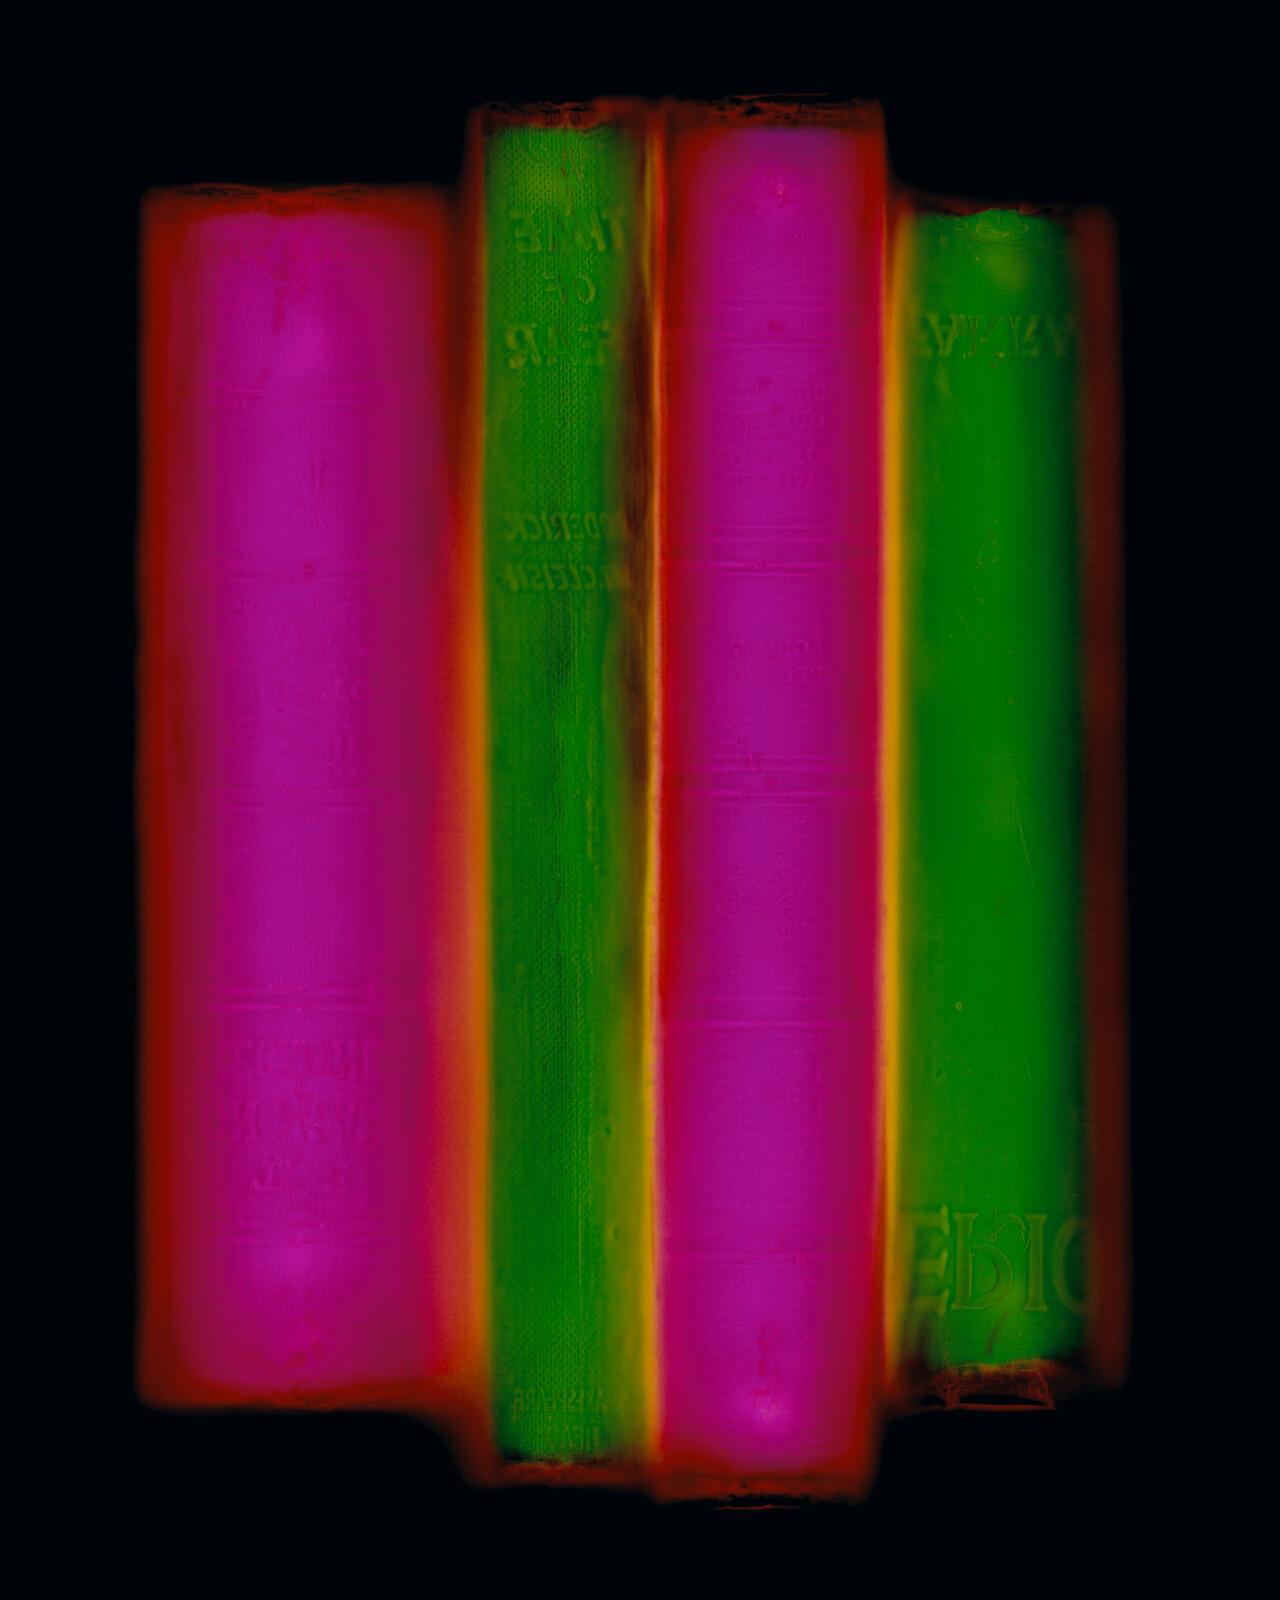 Archive (green/pink) - Penelope Davis